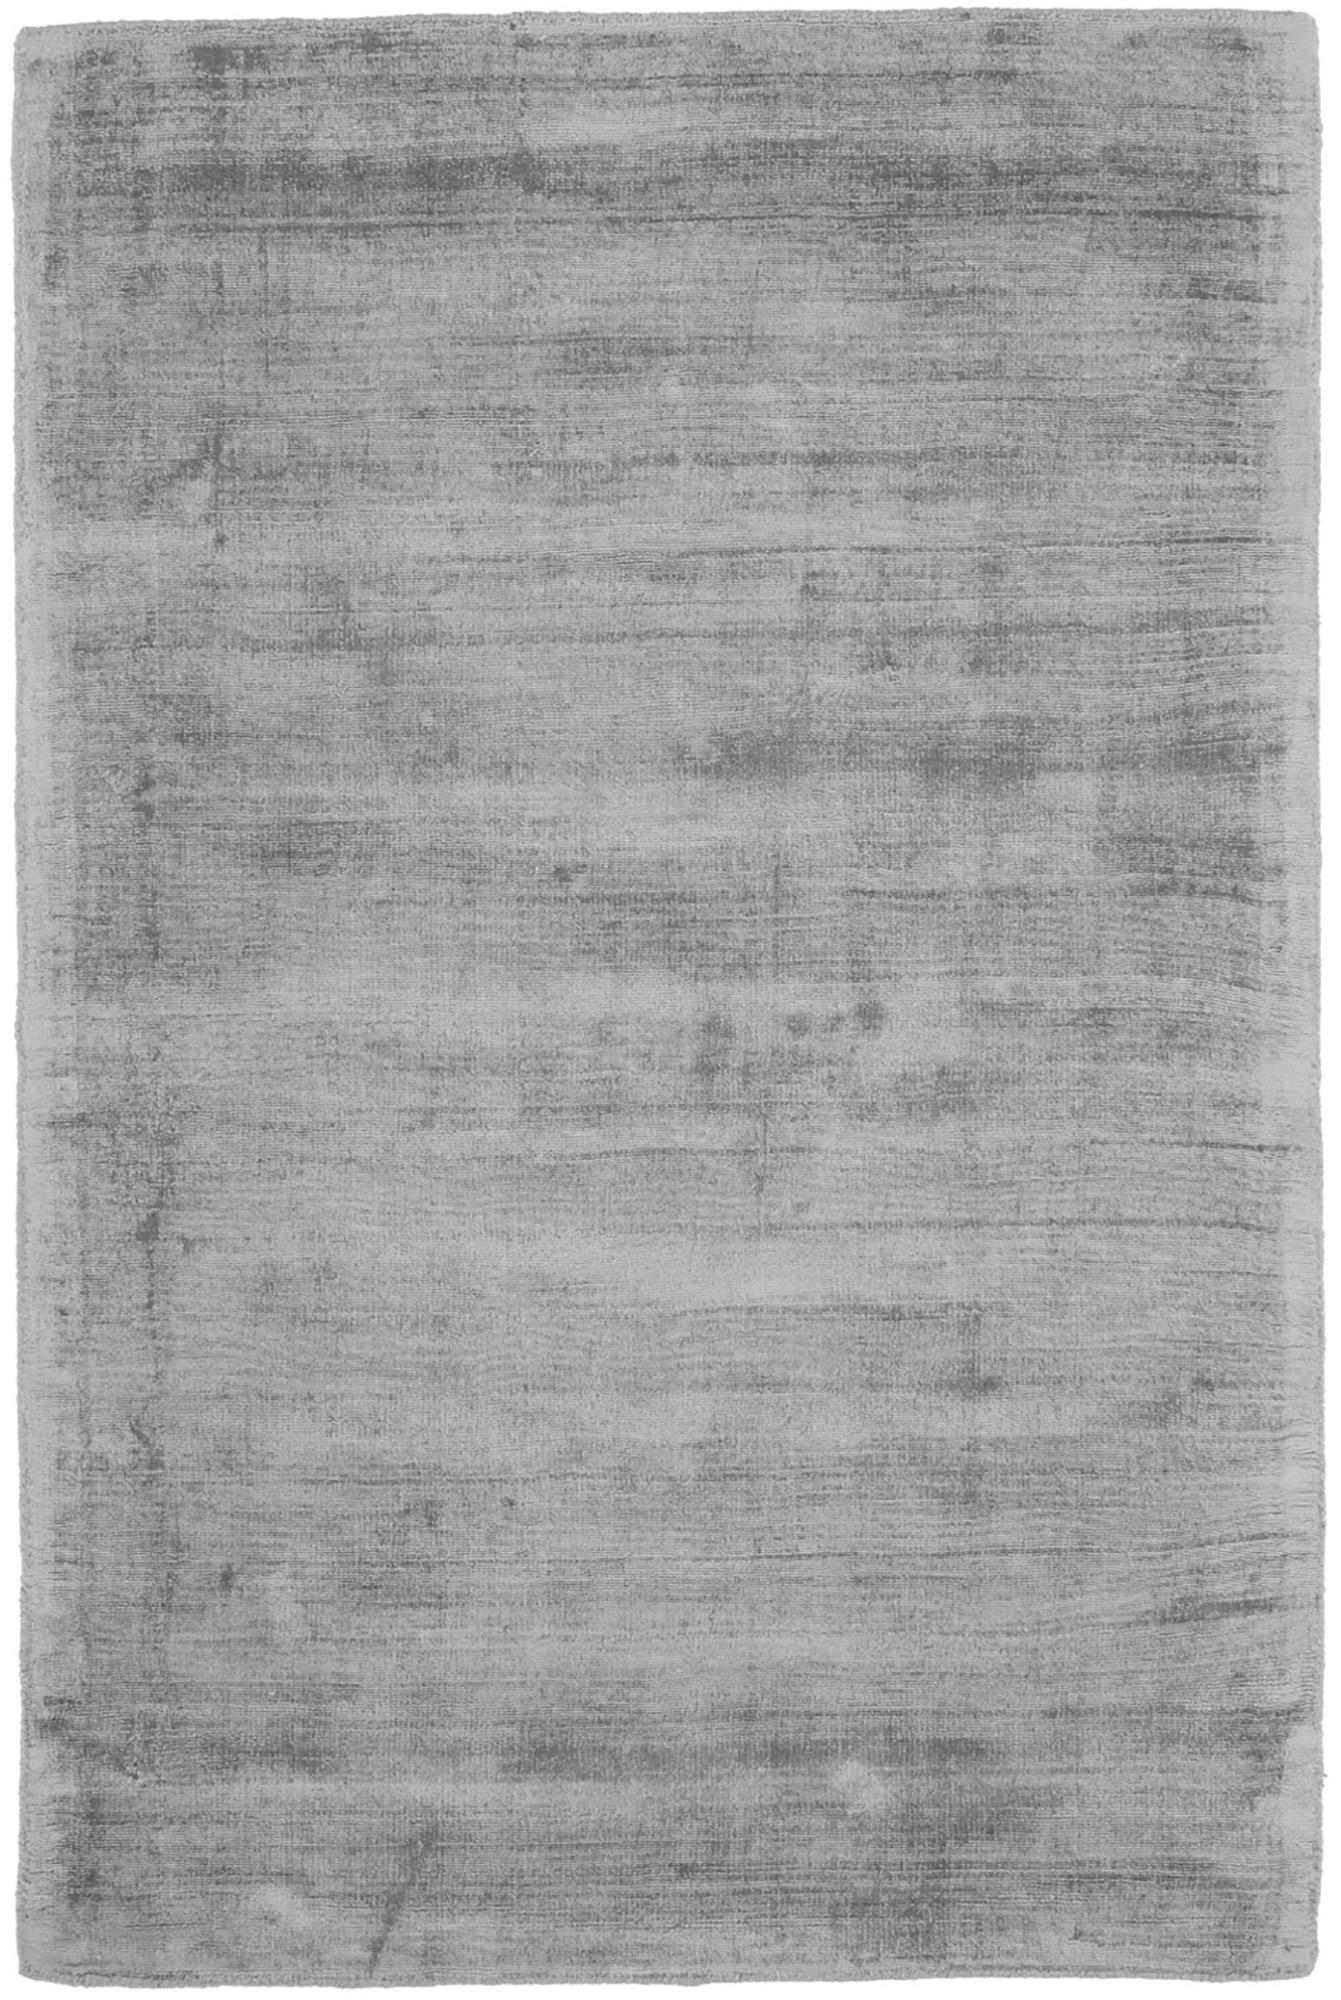 Handgewebter Viskoseteppich Jane in Grau, Flor: 100% Viskose, Grau, B 120 x L 180 cm (Größe S)